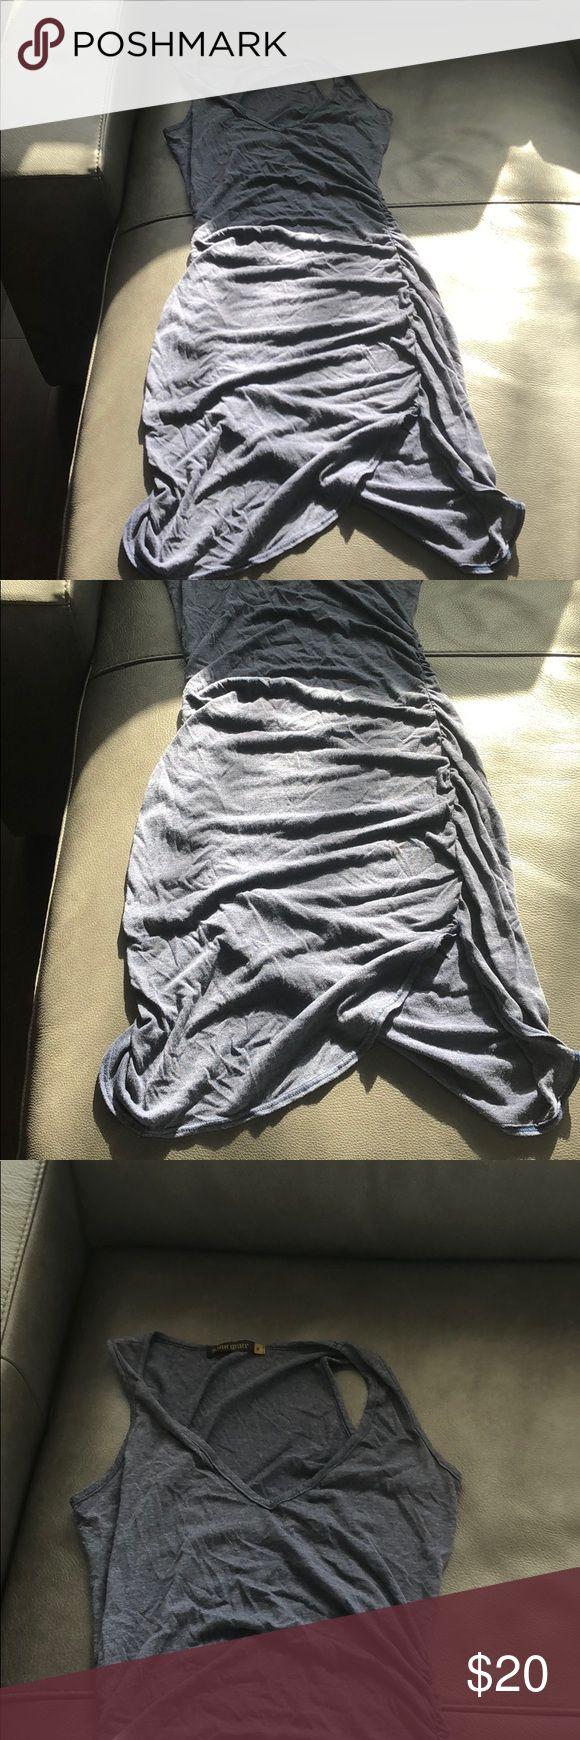 Saint Grace jersey dress Blue gray light weight jersey dress. Slight pulling on back. Saint Grace Dresses